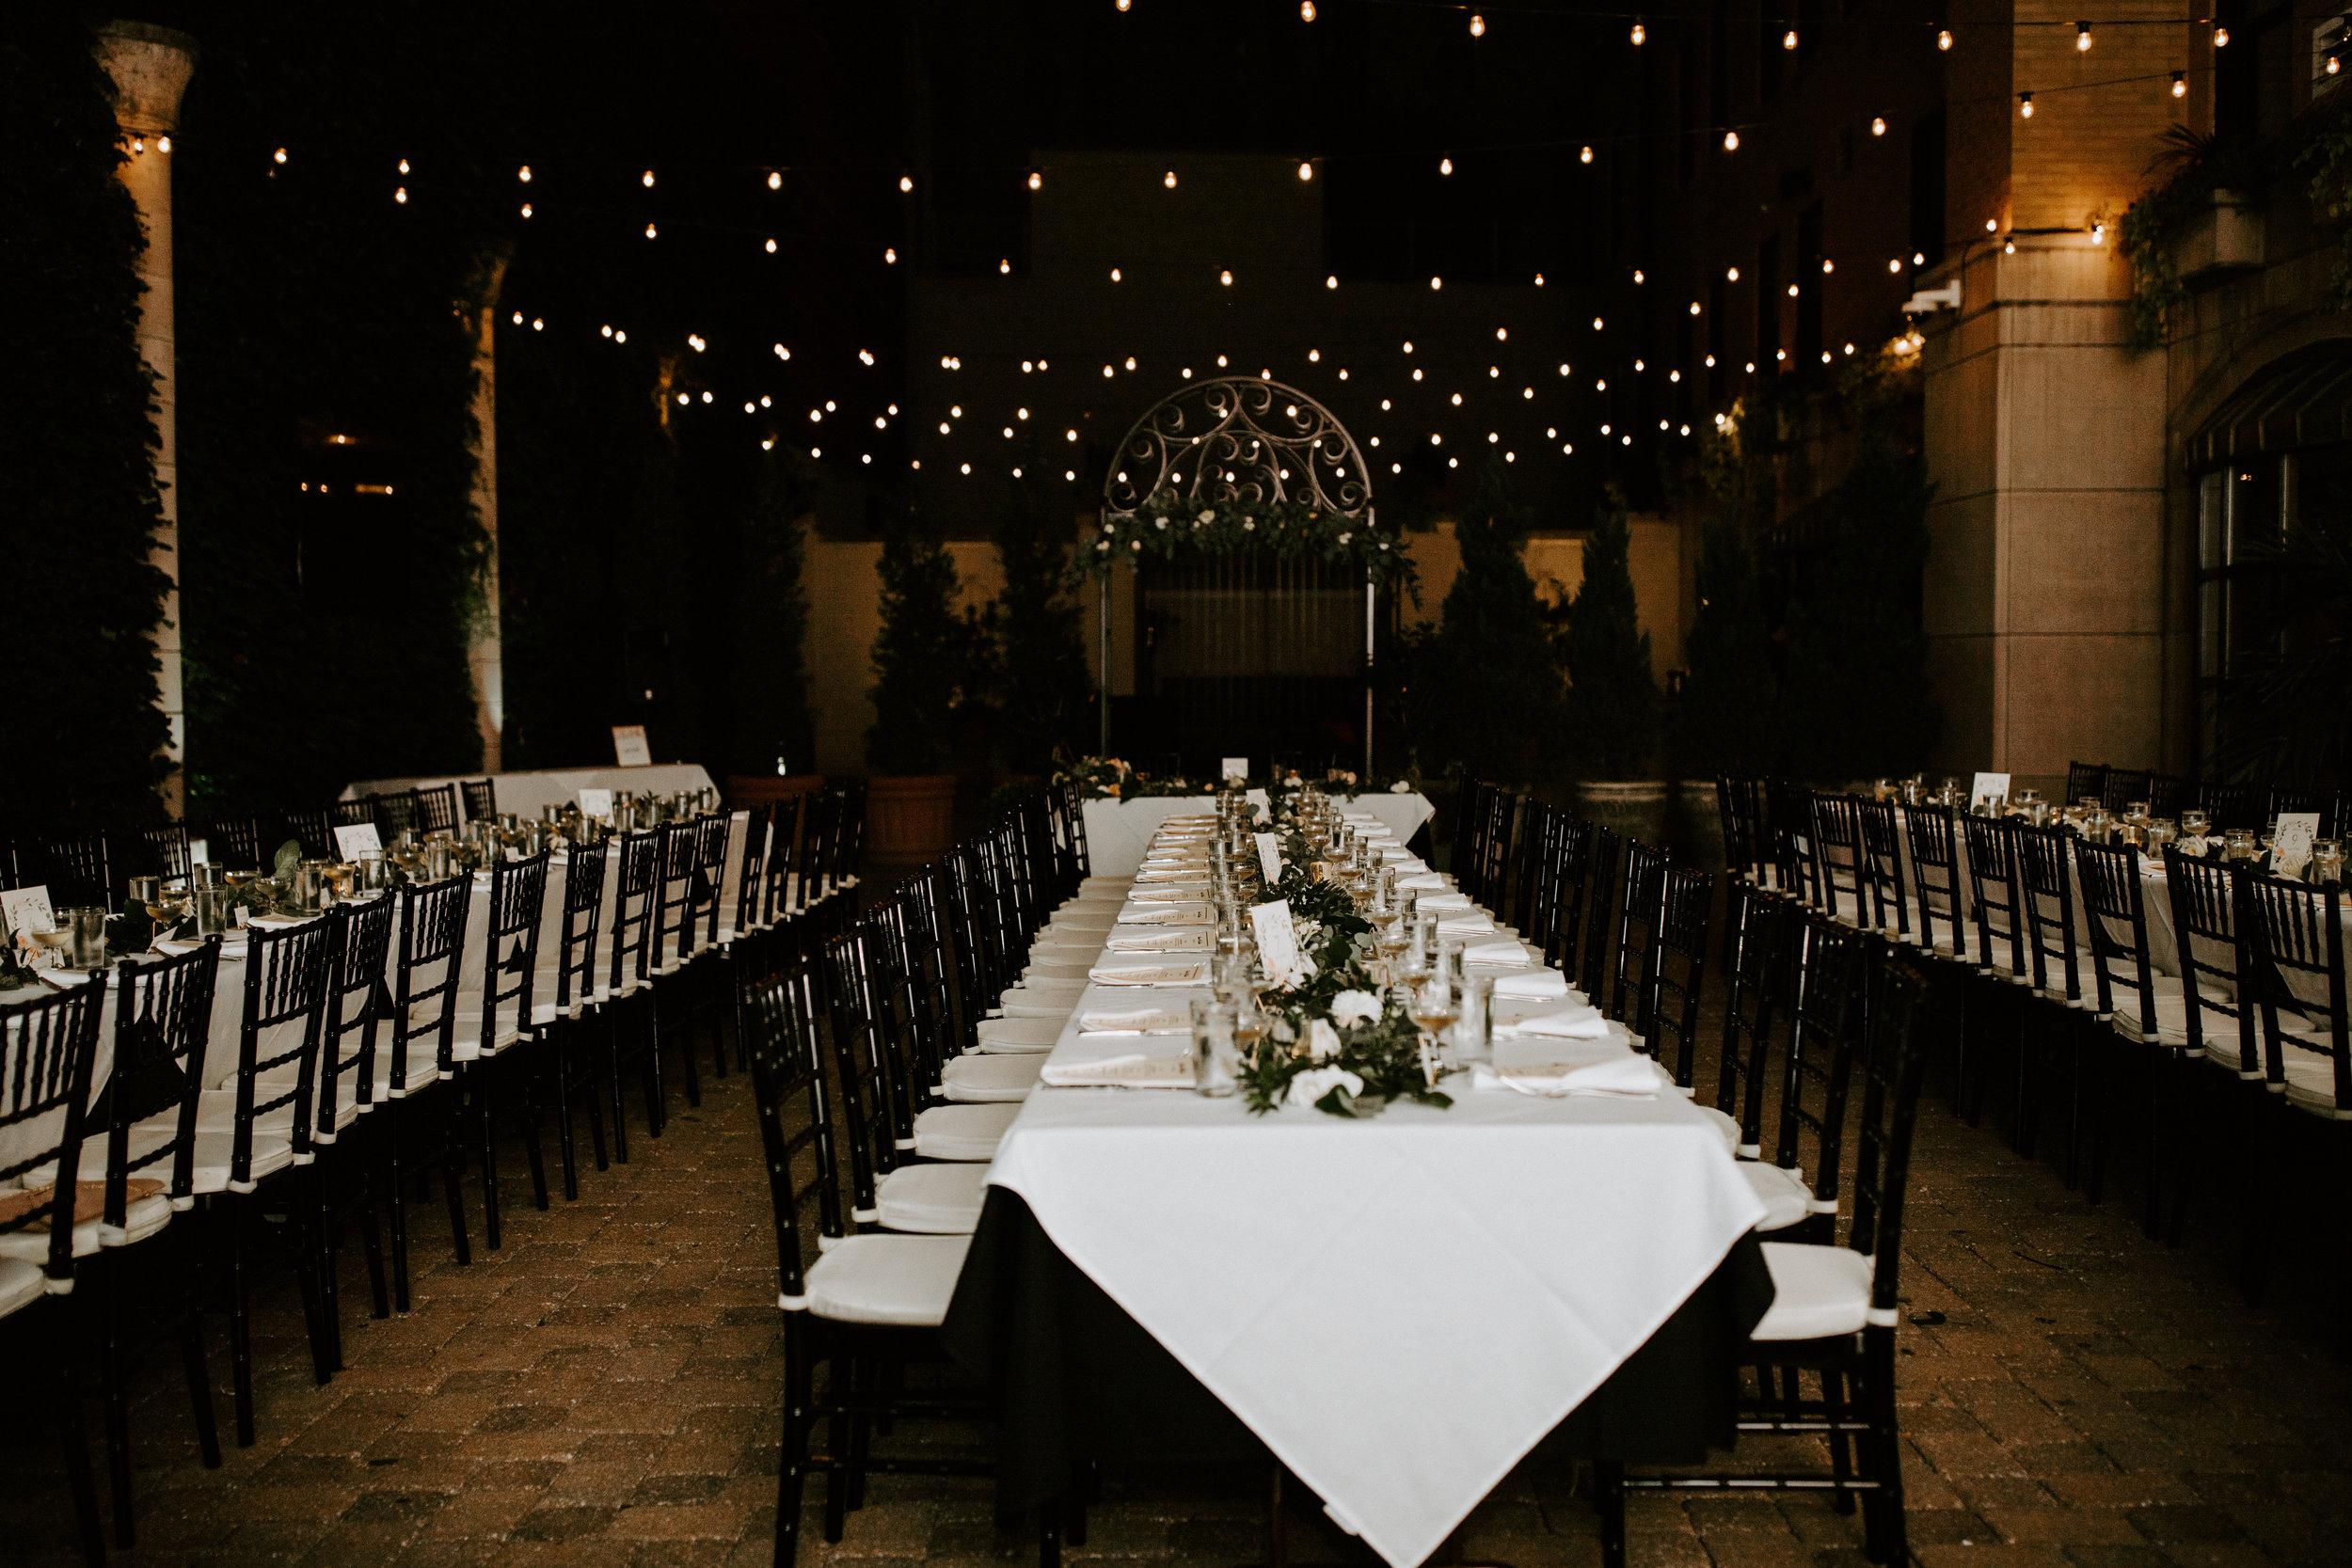 ST-LOUIS-MISSOURI-WEDDING-PHOTOGRAPHER-SCAPE-SARA+LUKE-492.jpg